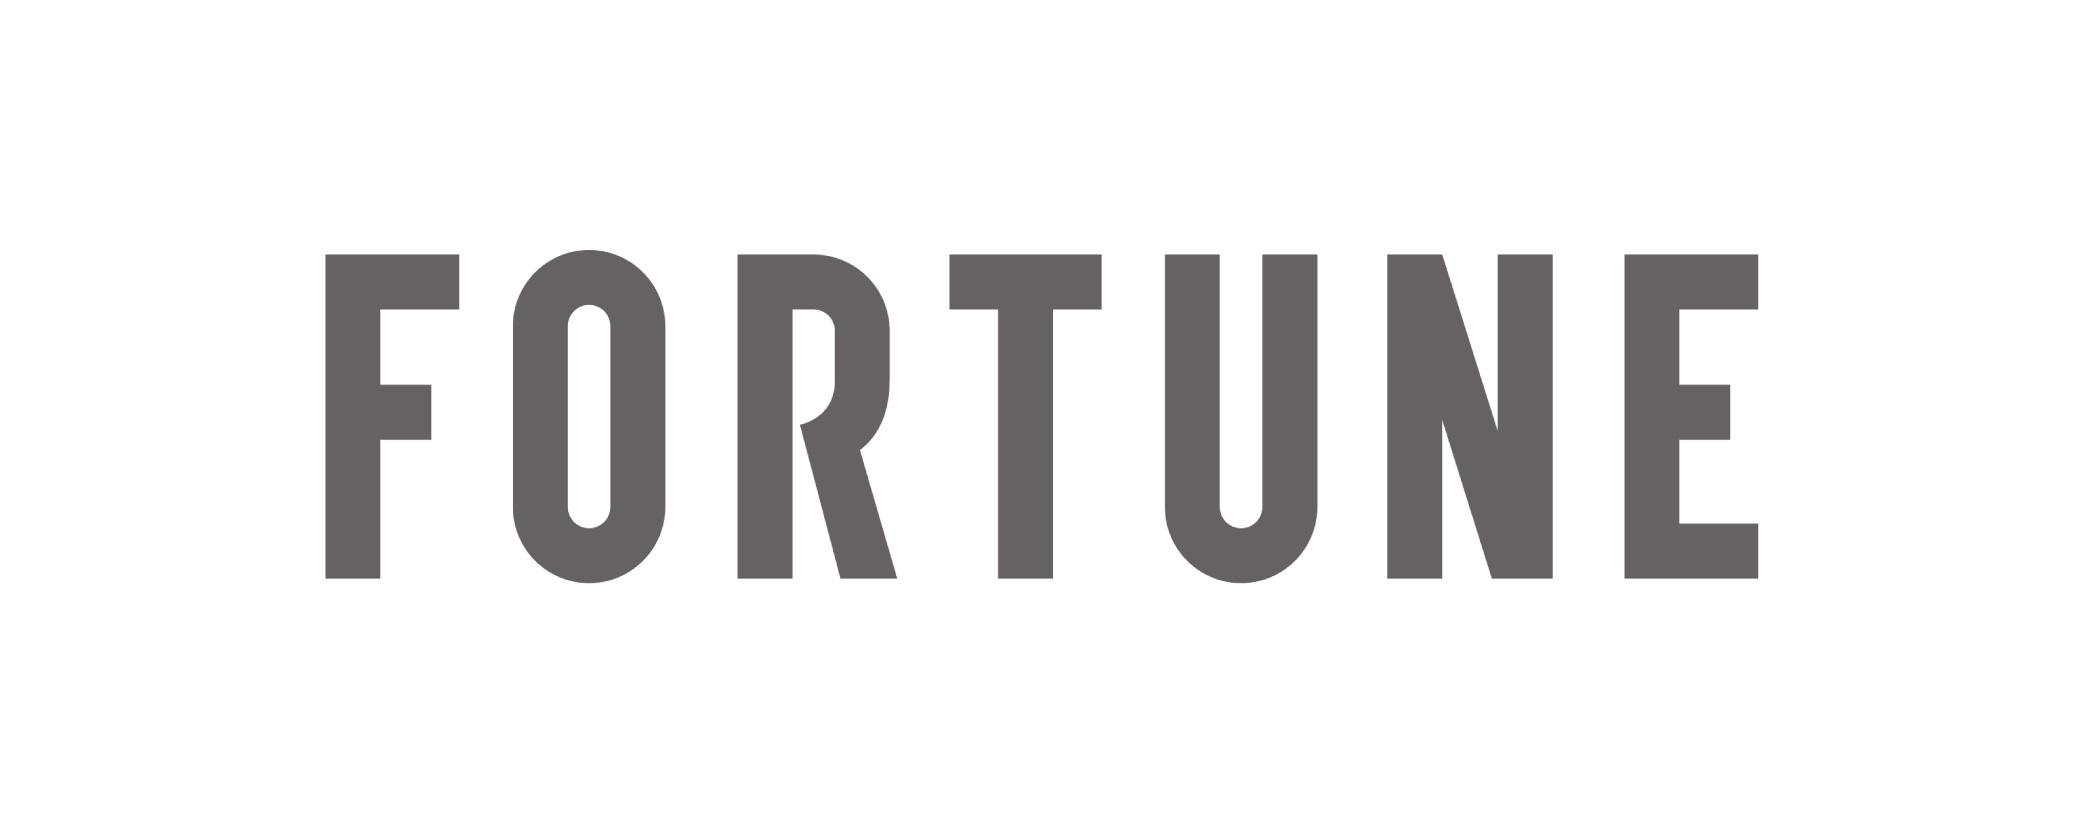 Fortune Grey 500 x 200.jpg